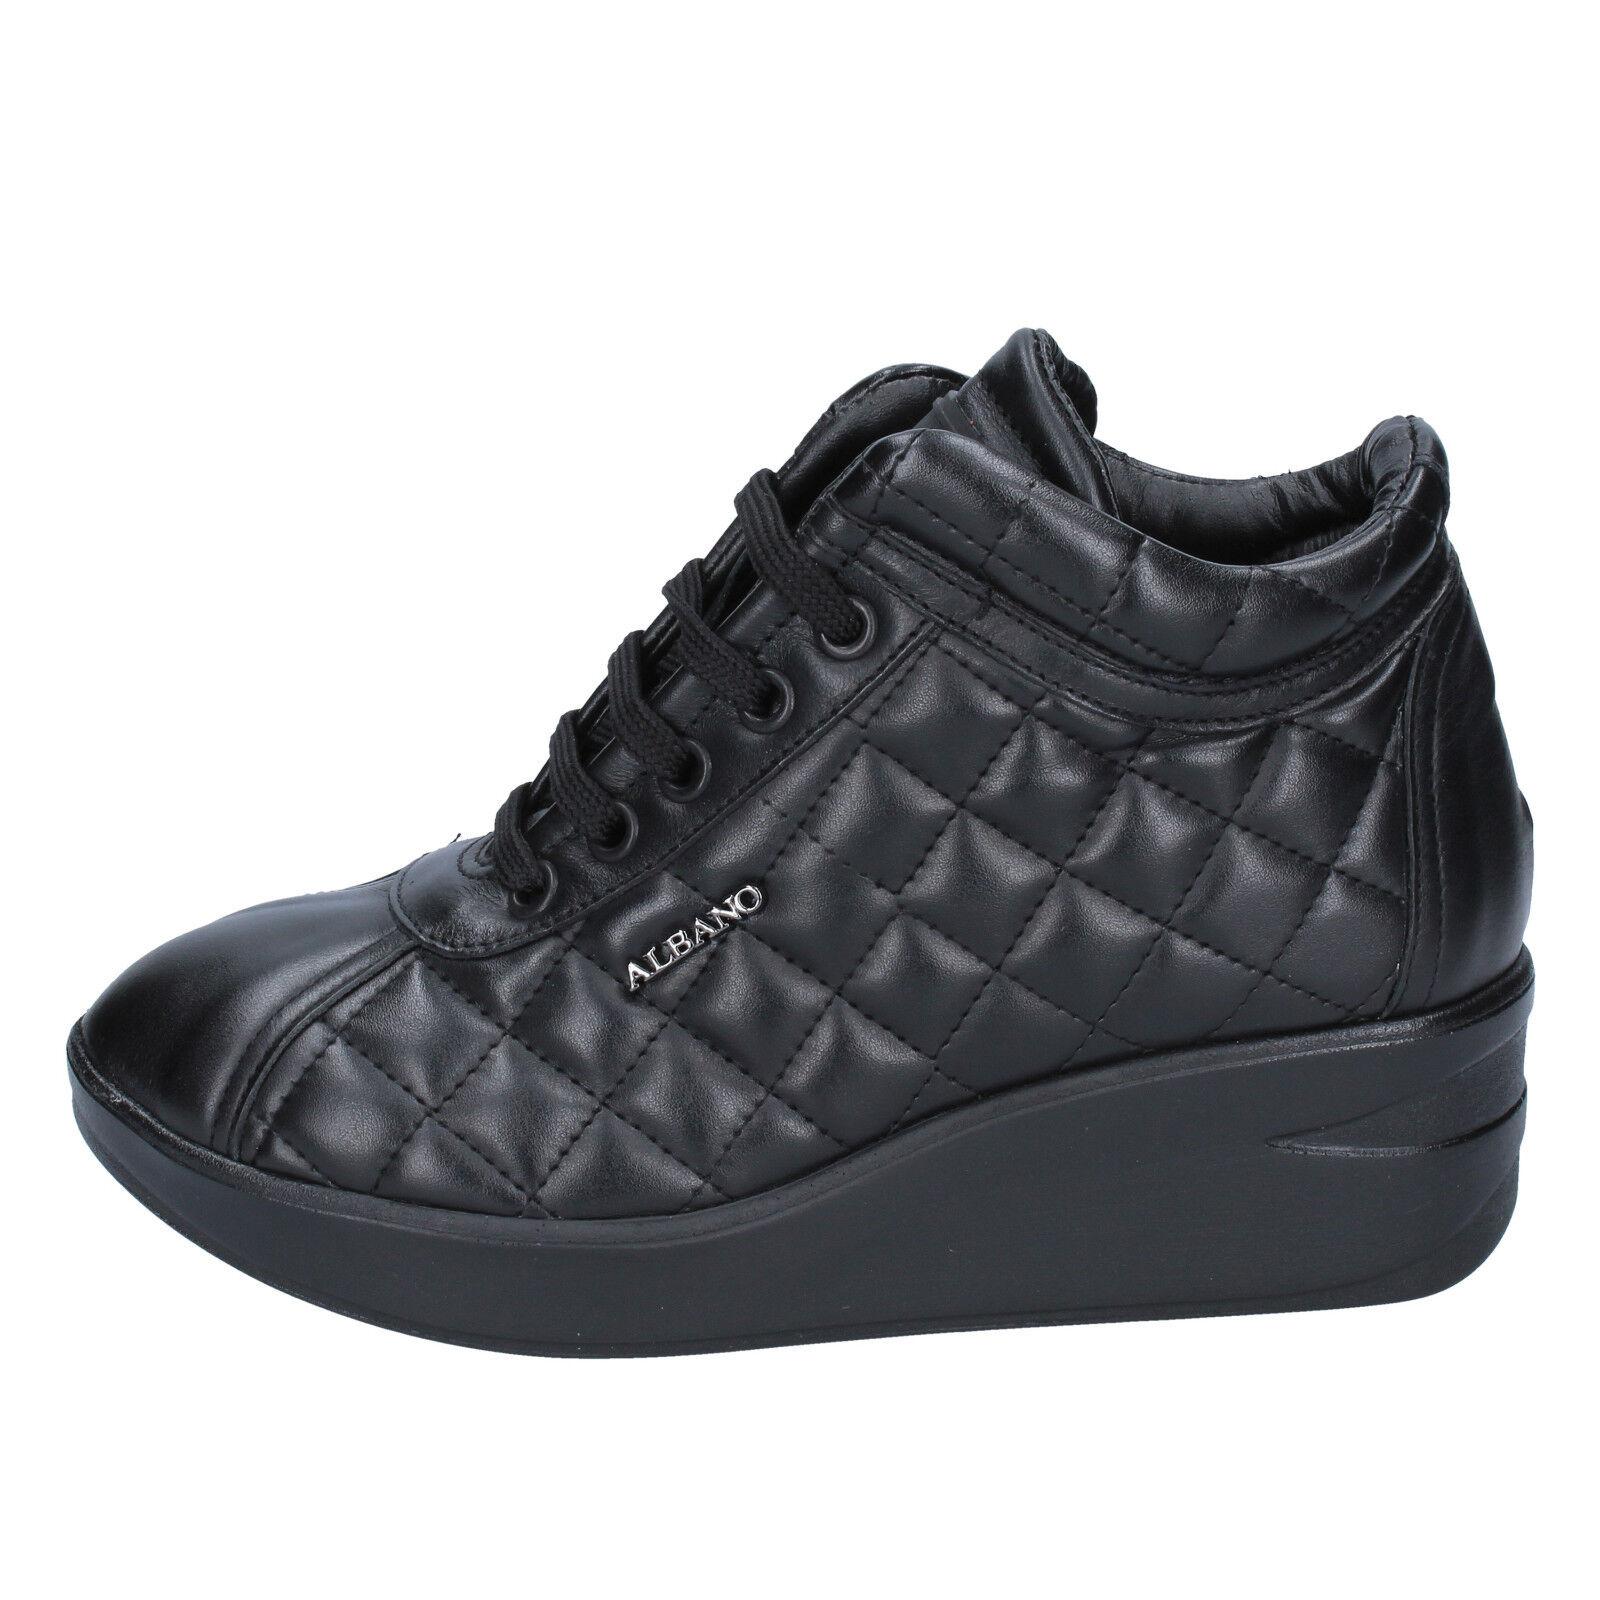 Scarpe donna scarpe da ginnastica ALBANO EU 35 EU ALBANO scarpe da ginnastica donna nero pelle BY883   aa8f02